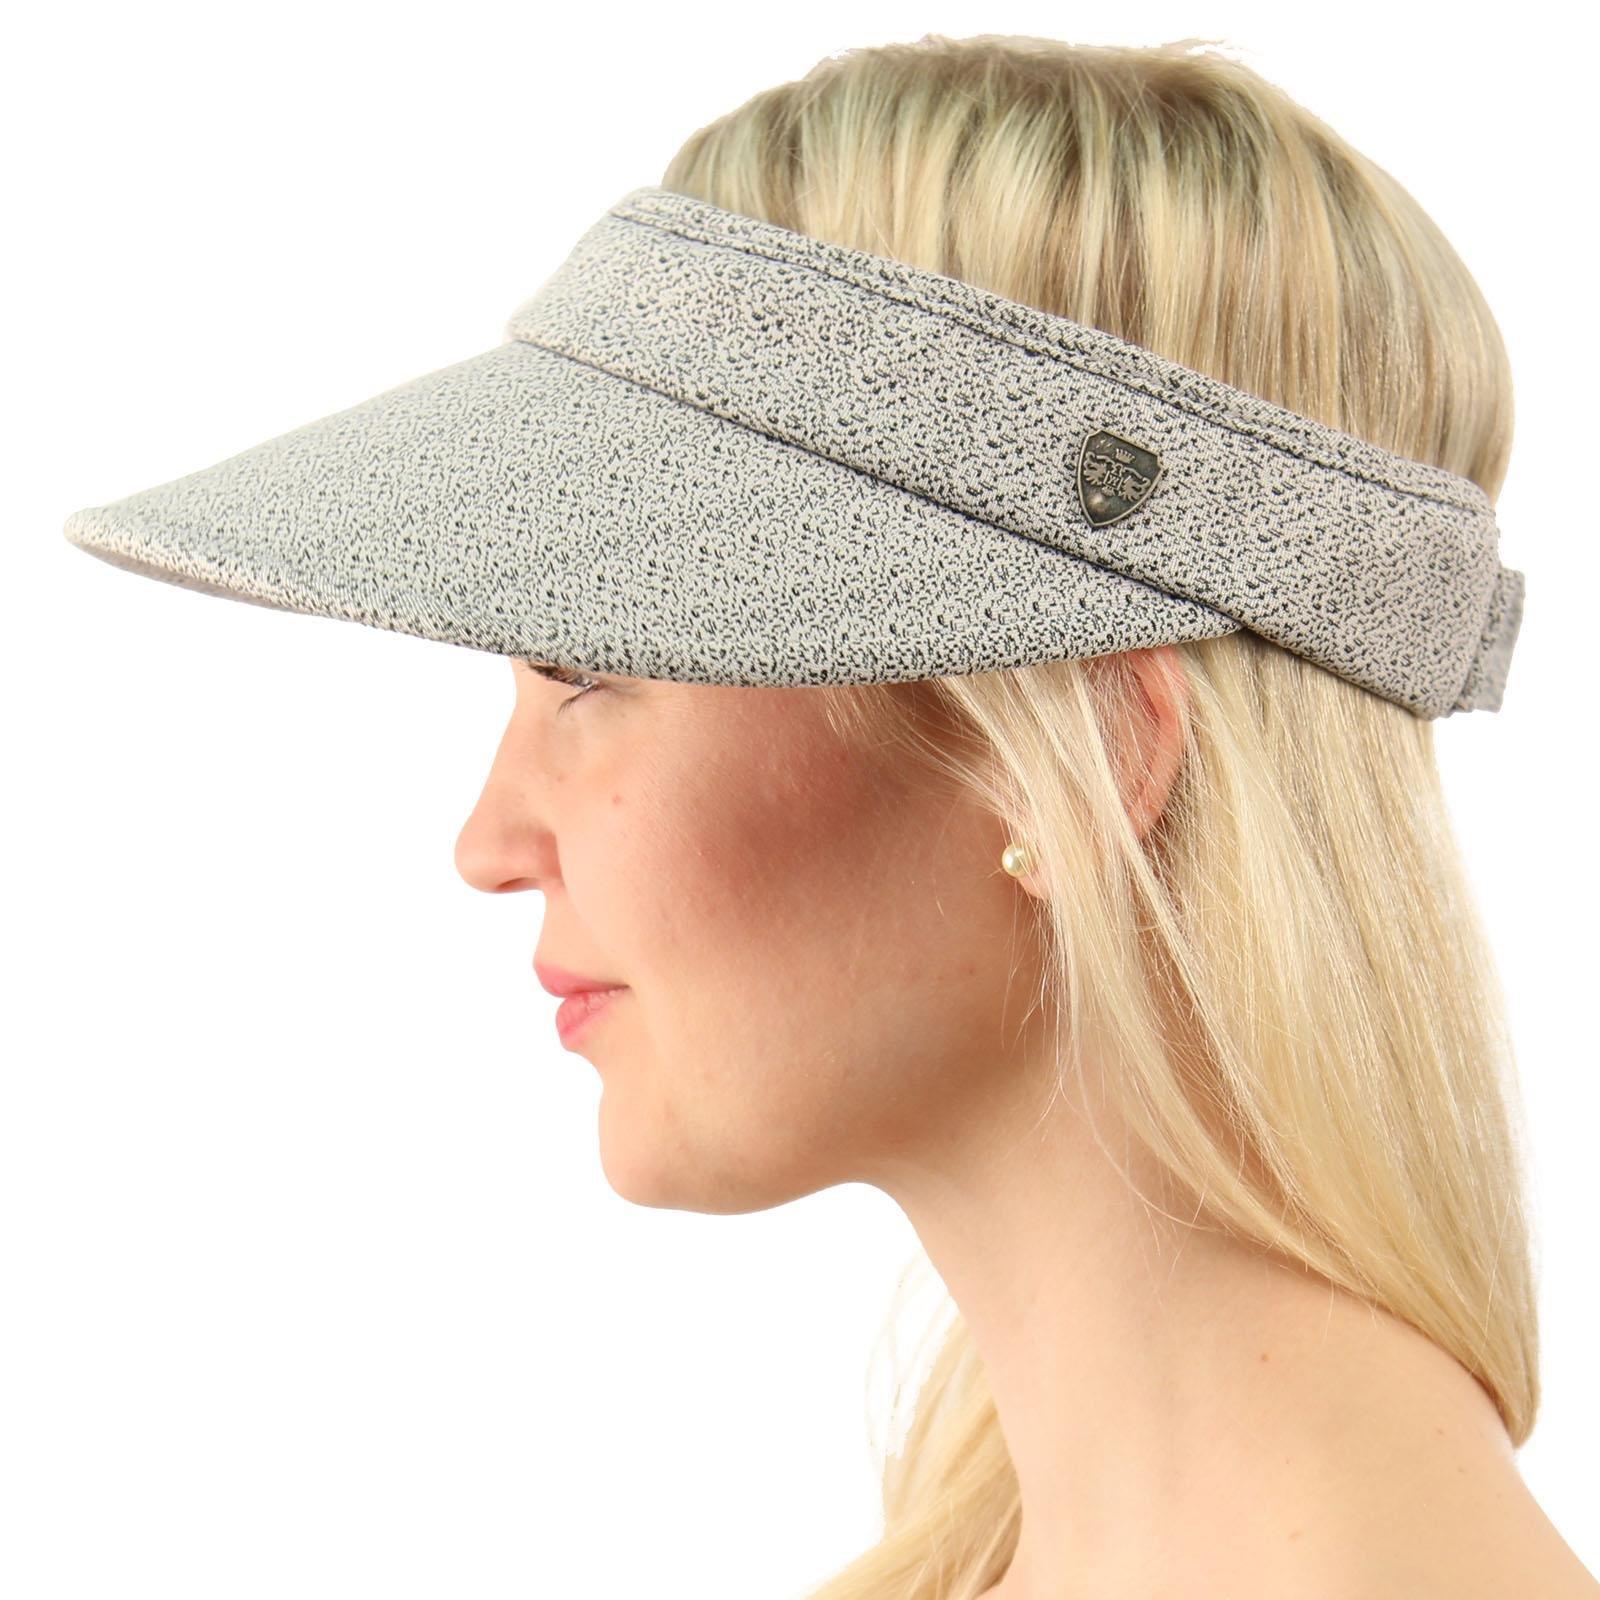 UPF UV Sun Protection Wide Brim 100% Cotton Beach Pool Visor Golf Cap Hat Gray by SK Hat shop